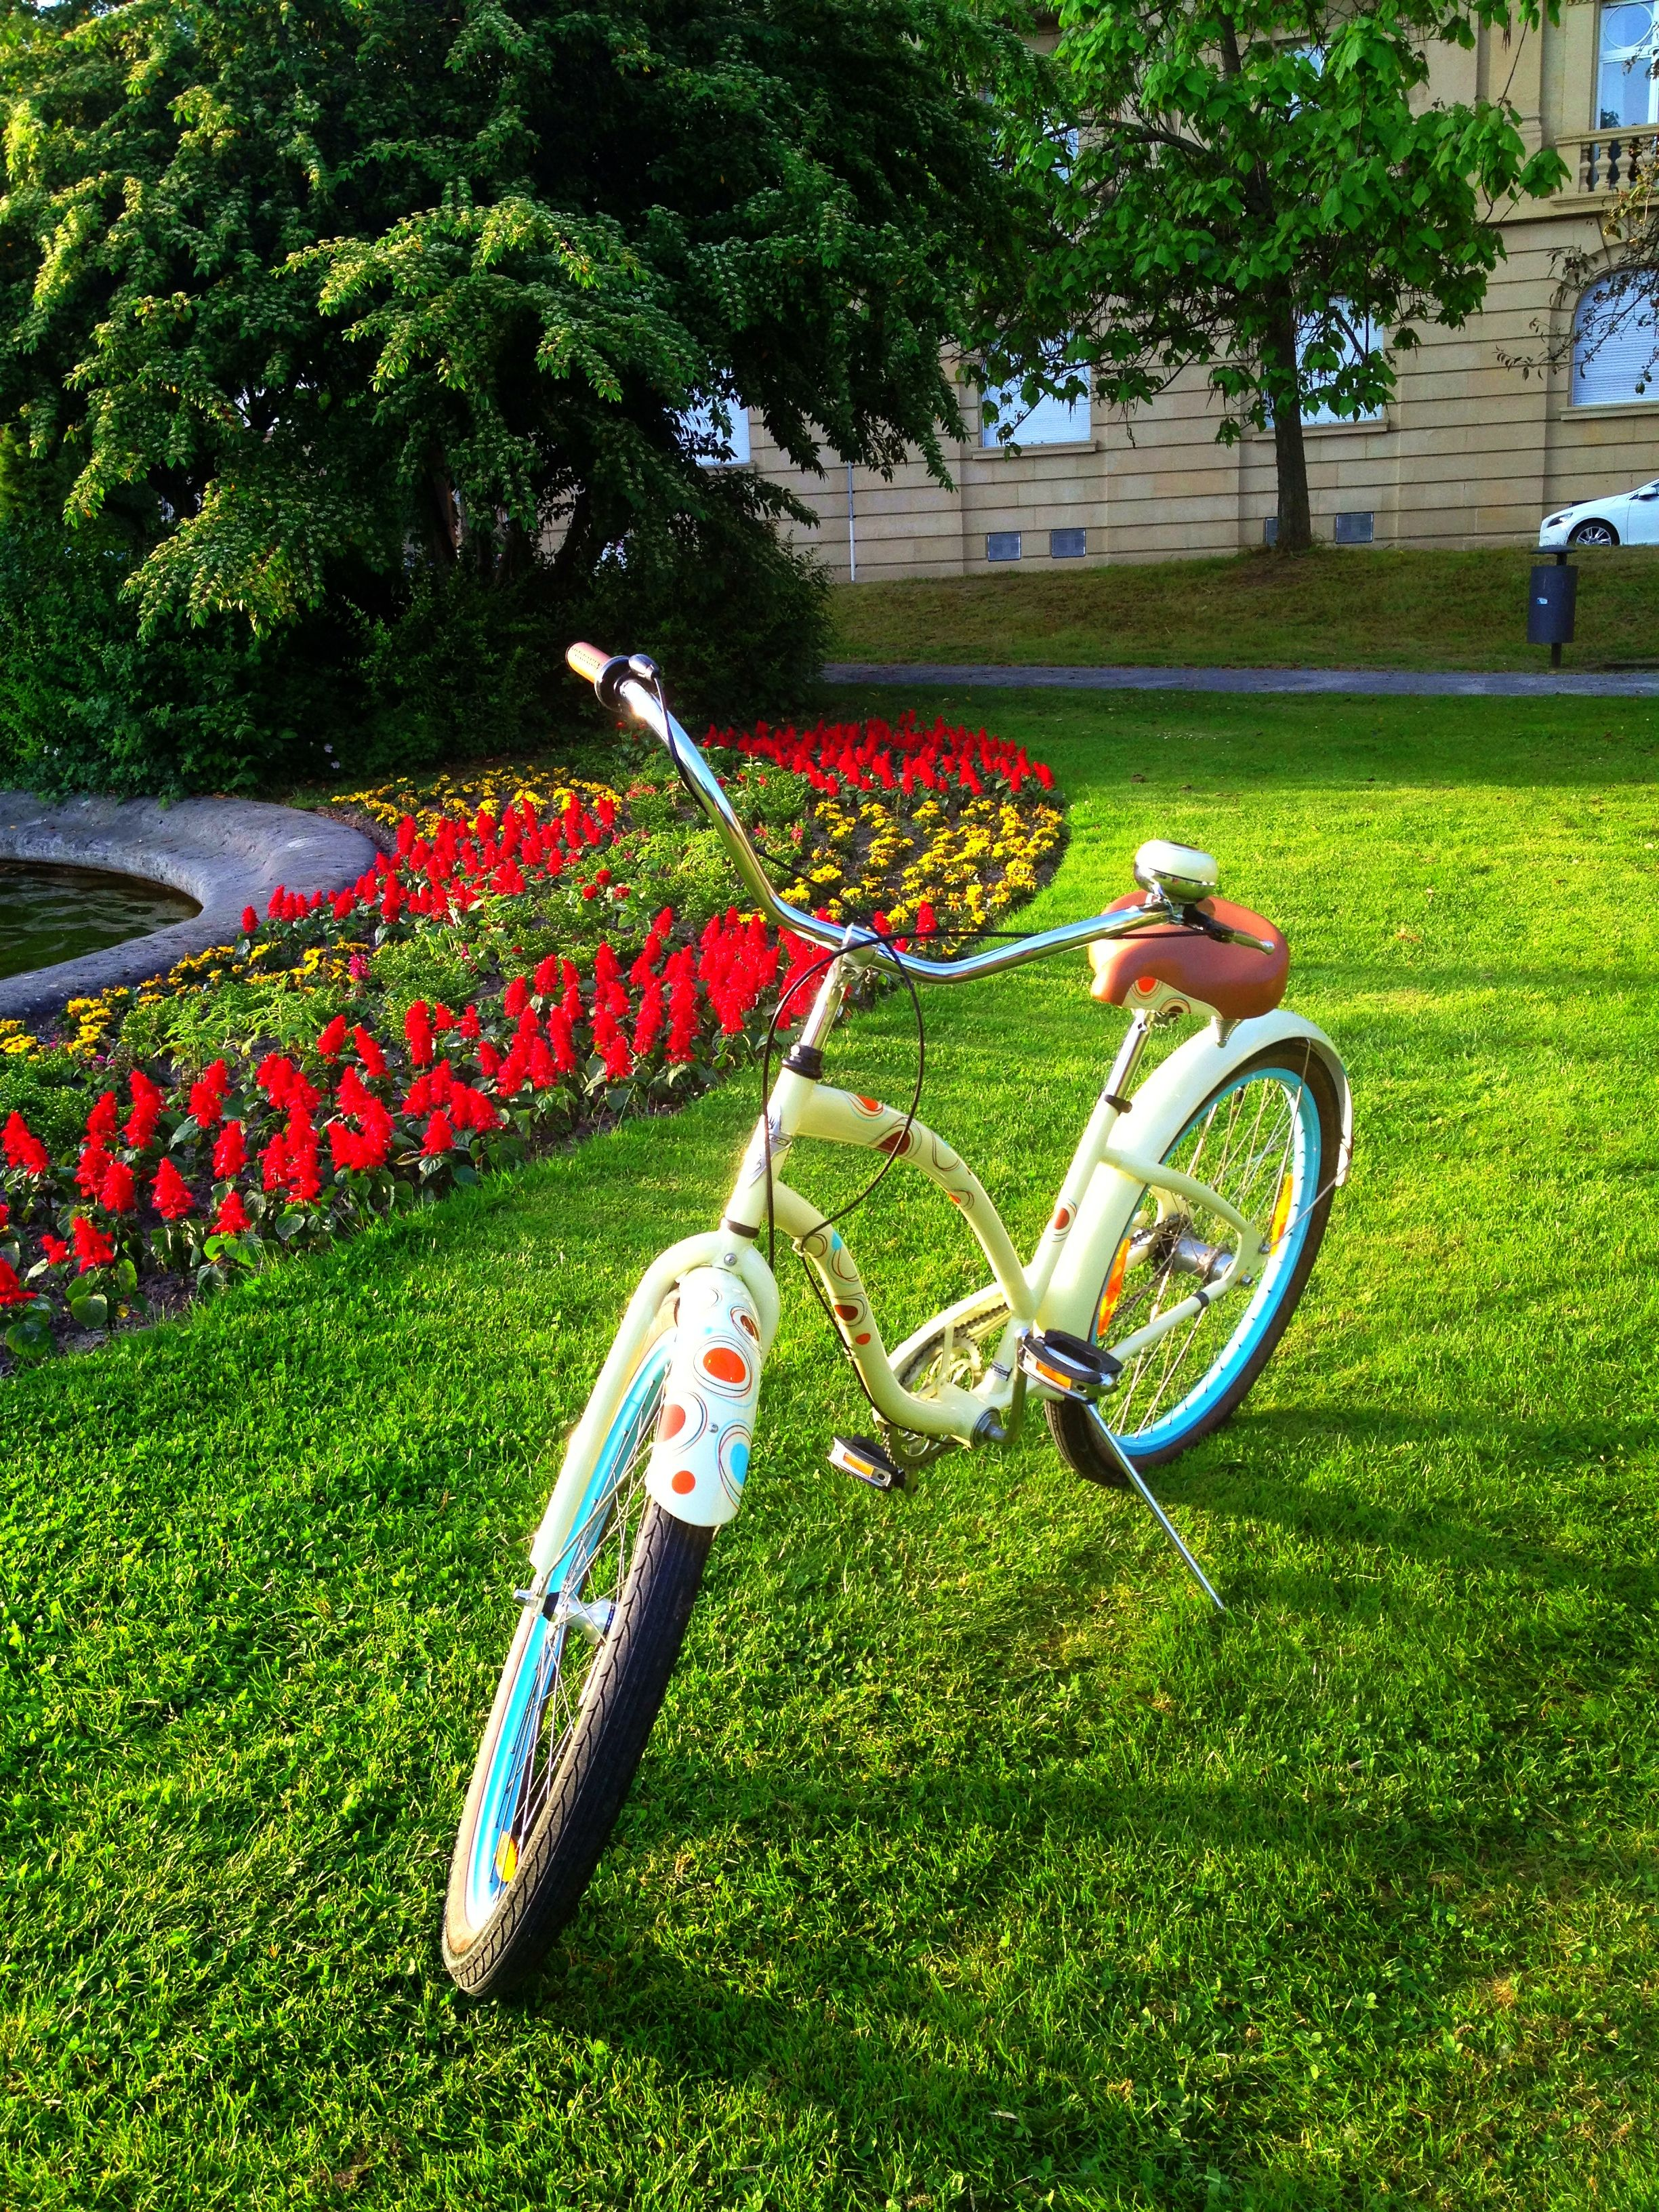 My retro bike